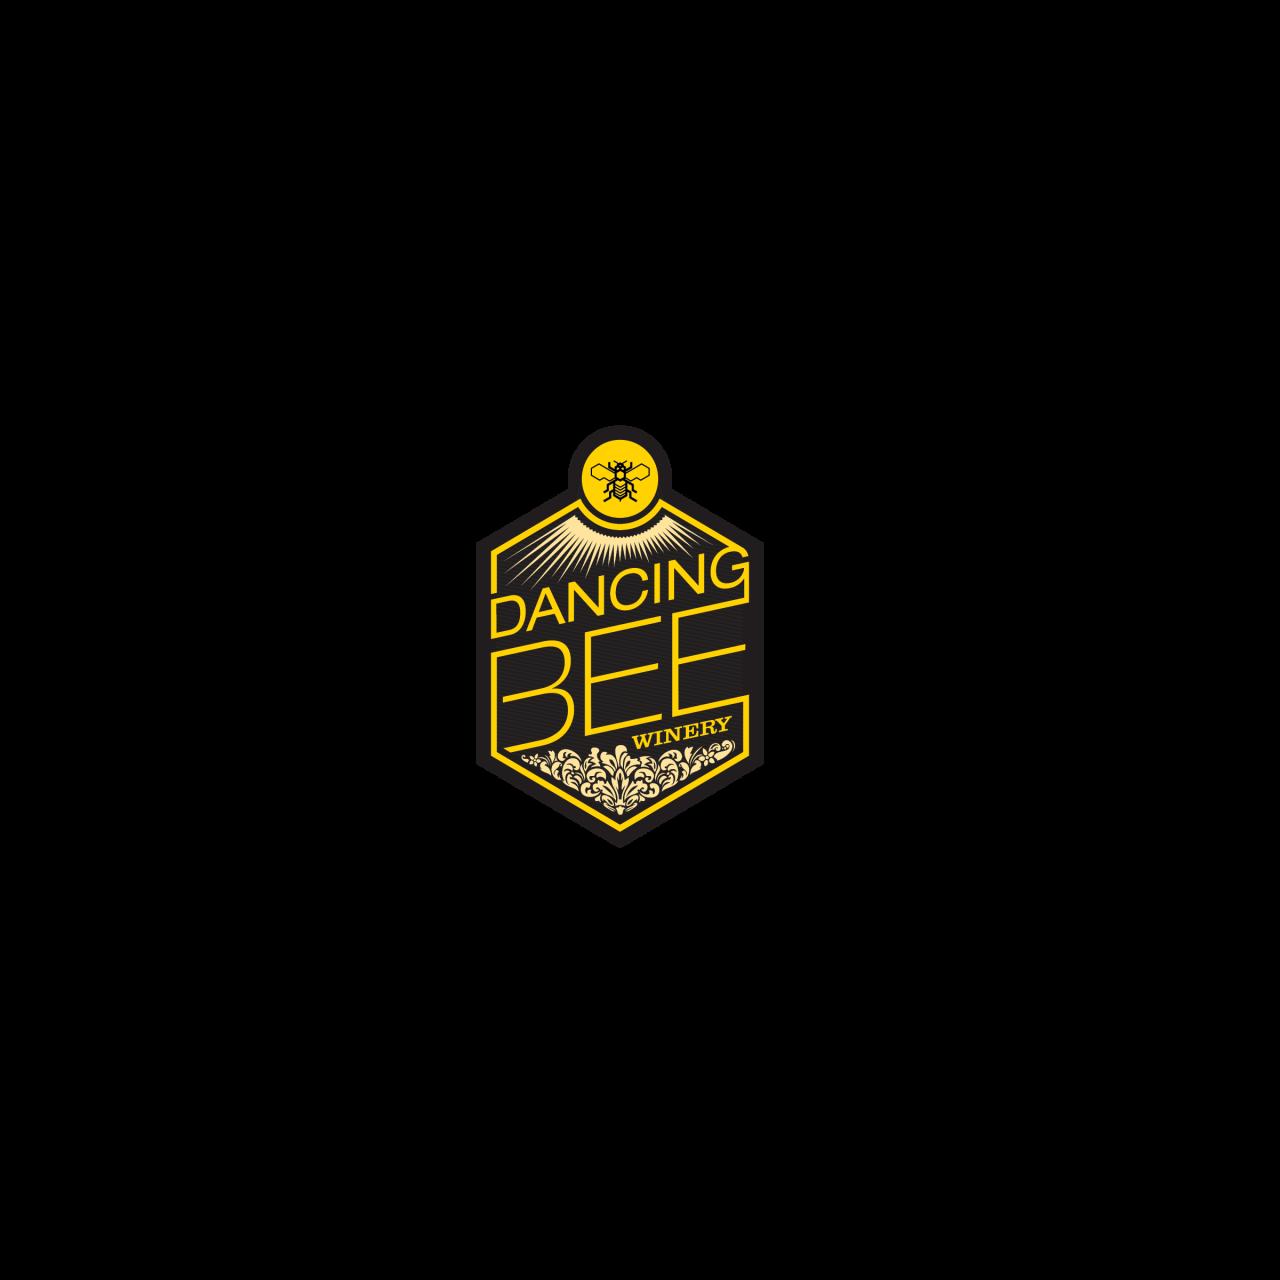 Image of Dancing Bee Winery logo